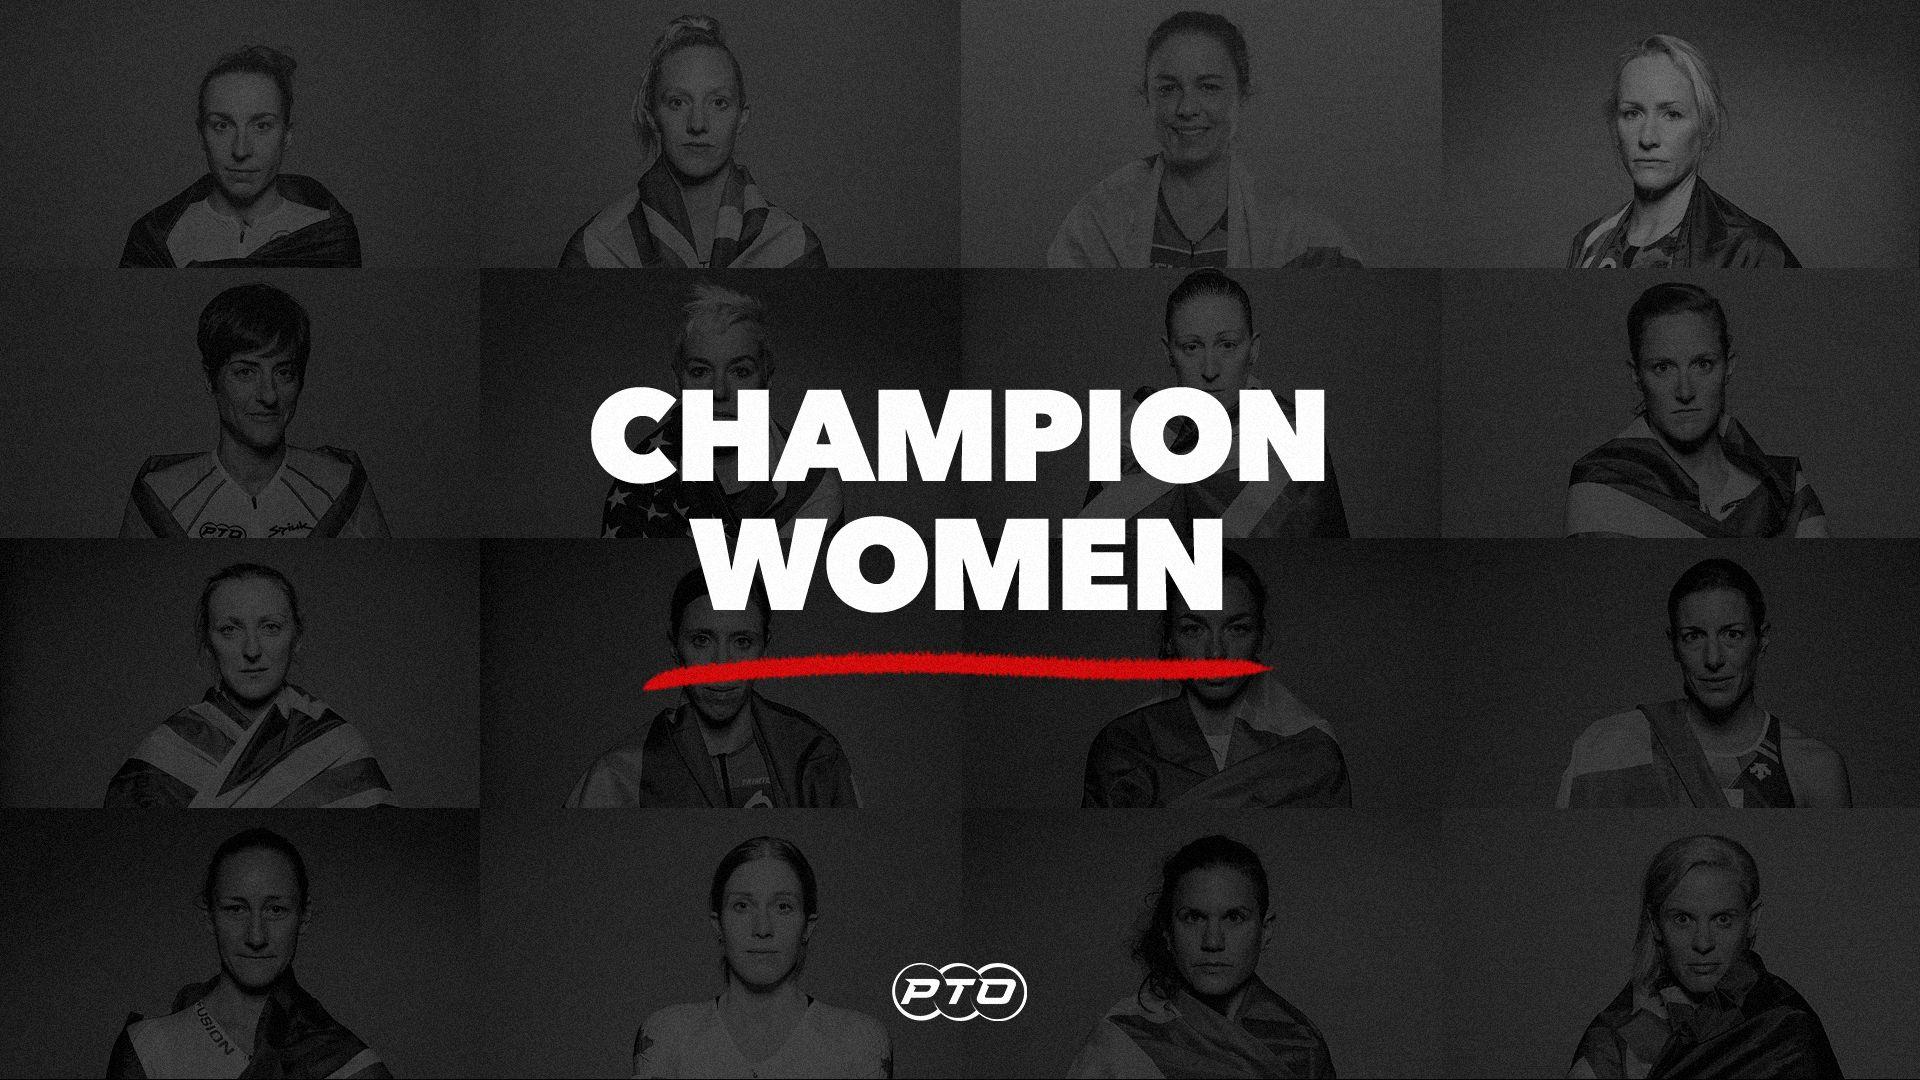 Celebrating PTO women on International Women's Day